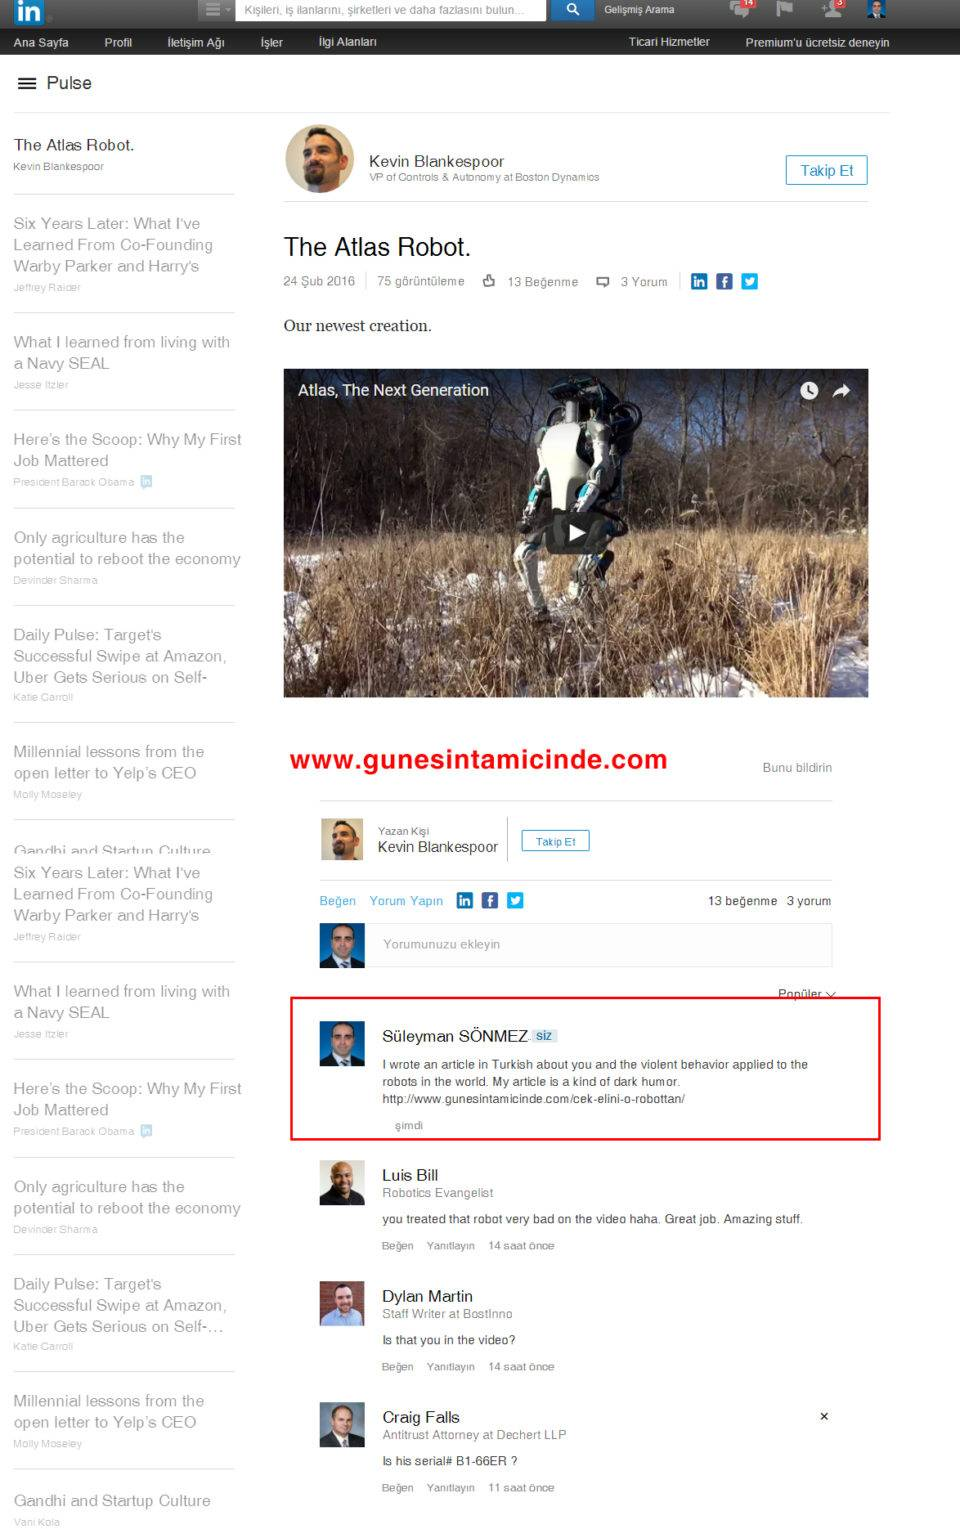 Linkedin-robotovuran-adam